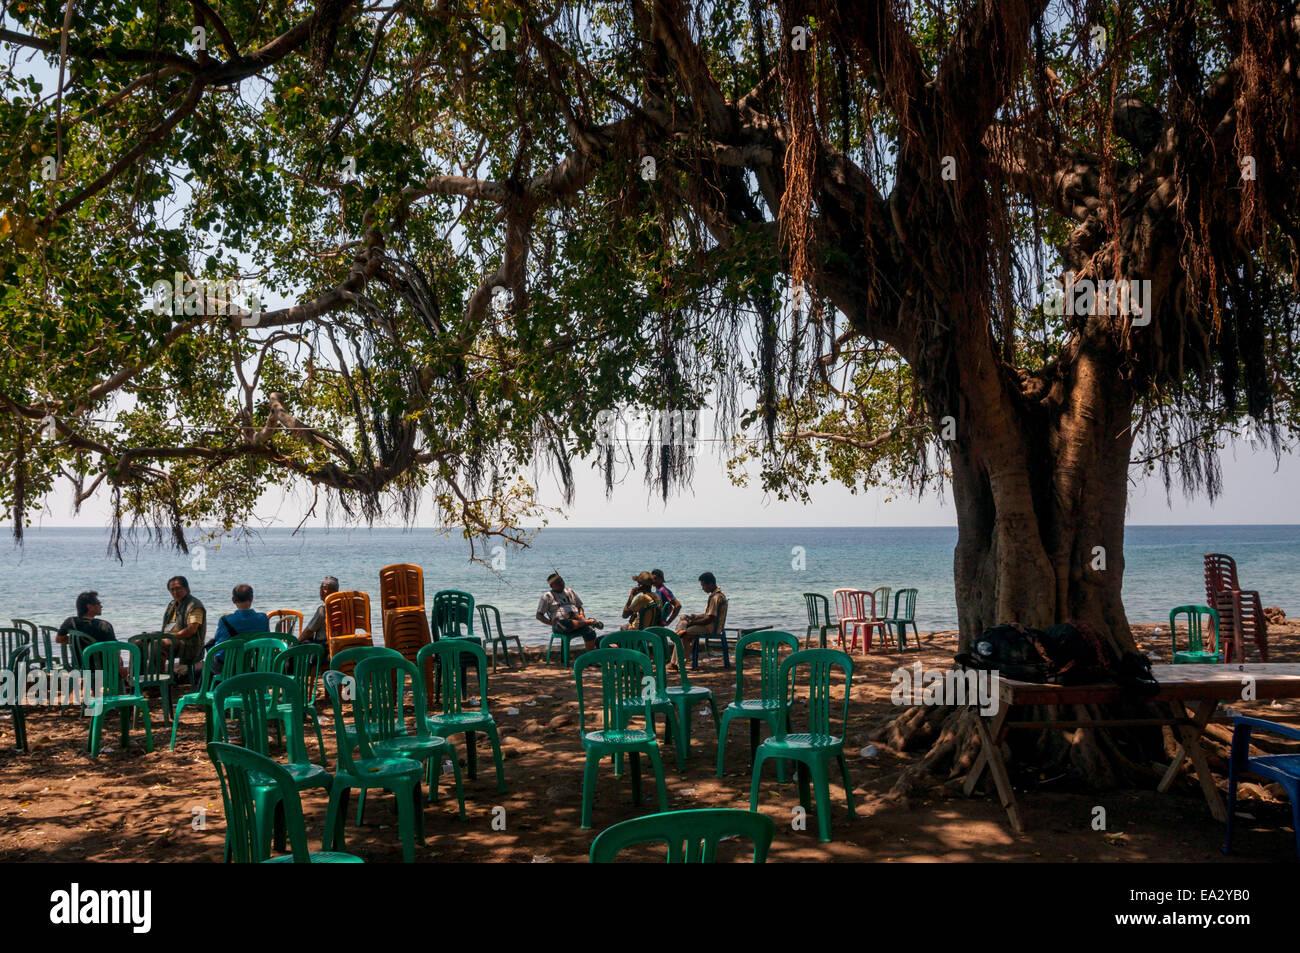 Local people enjoying sea panorama. Lamagute village, Lembata Island, Indonesia. - Stock Image